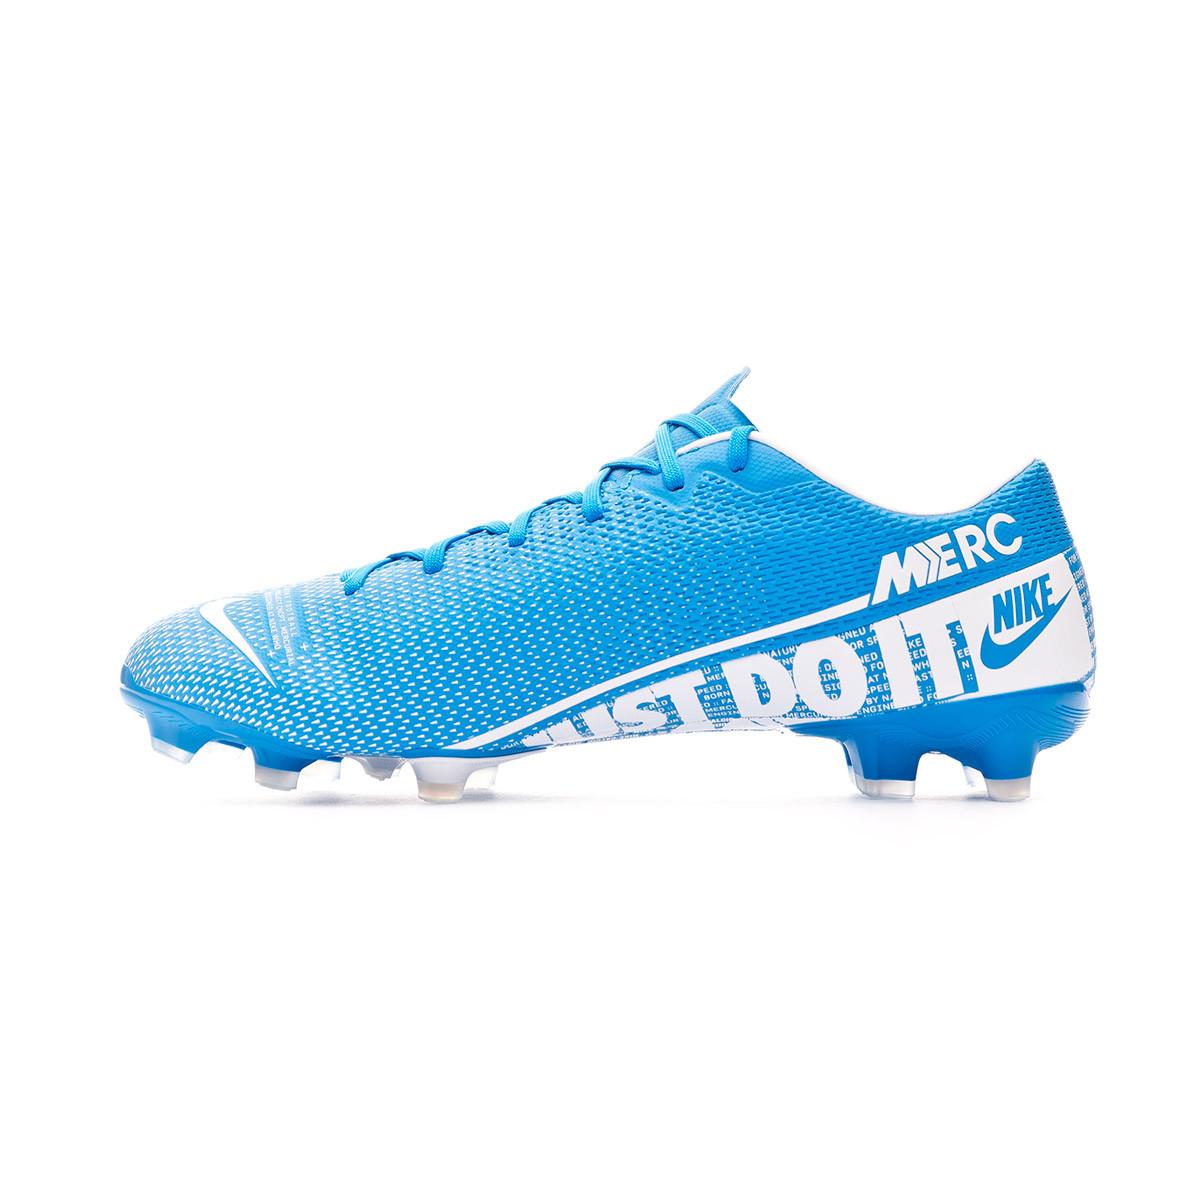 Chaussure de foot Nike Mercurial Vapor XIII Academy FGMG